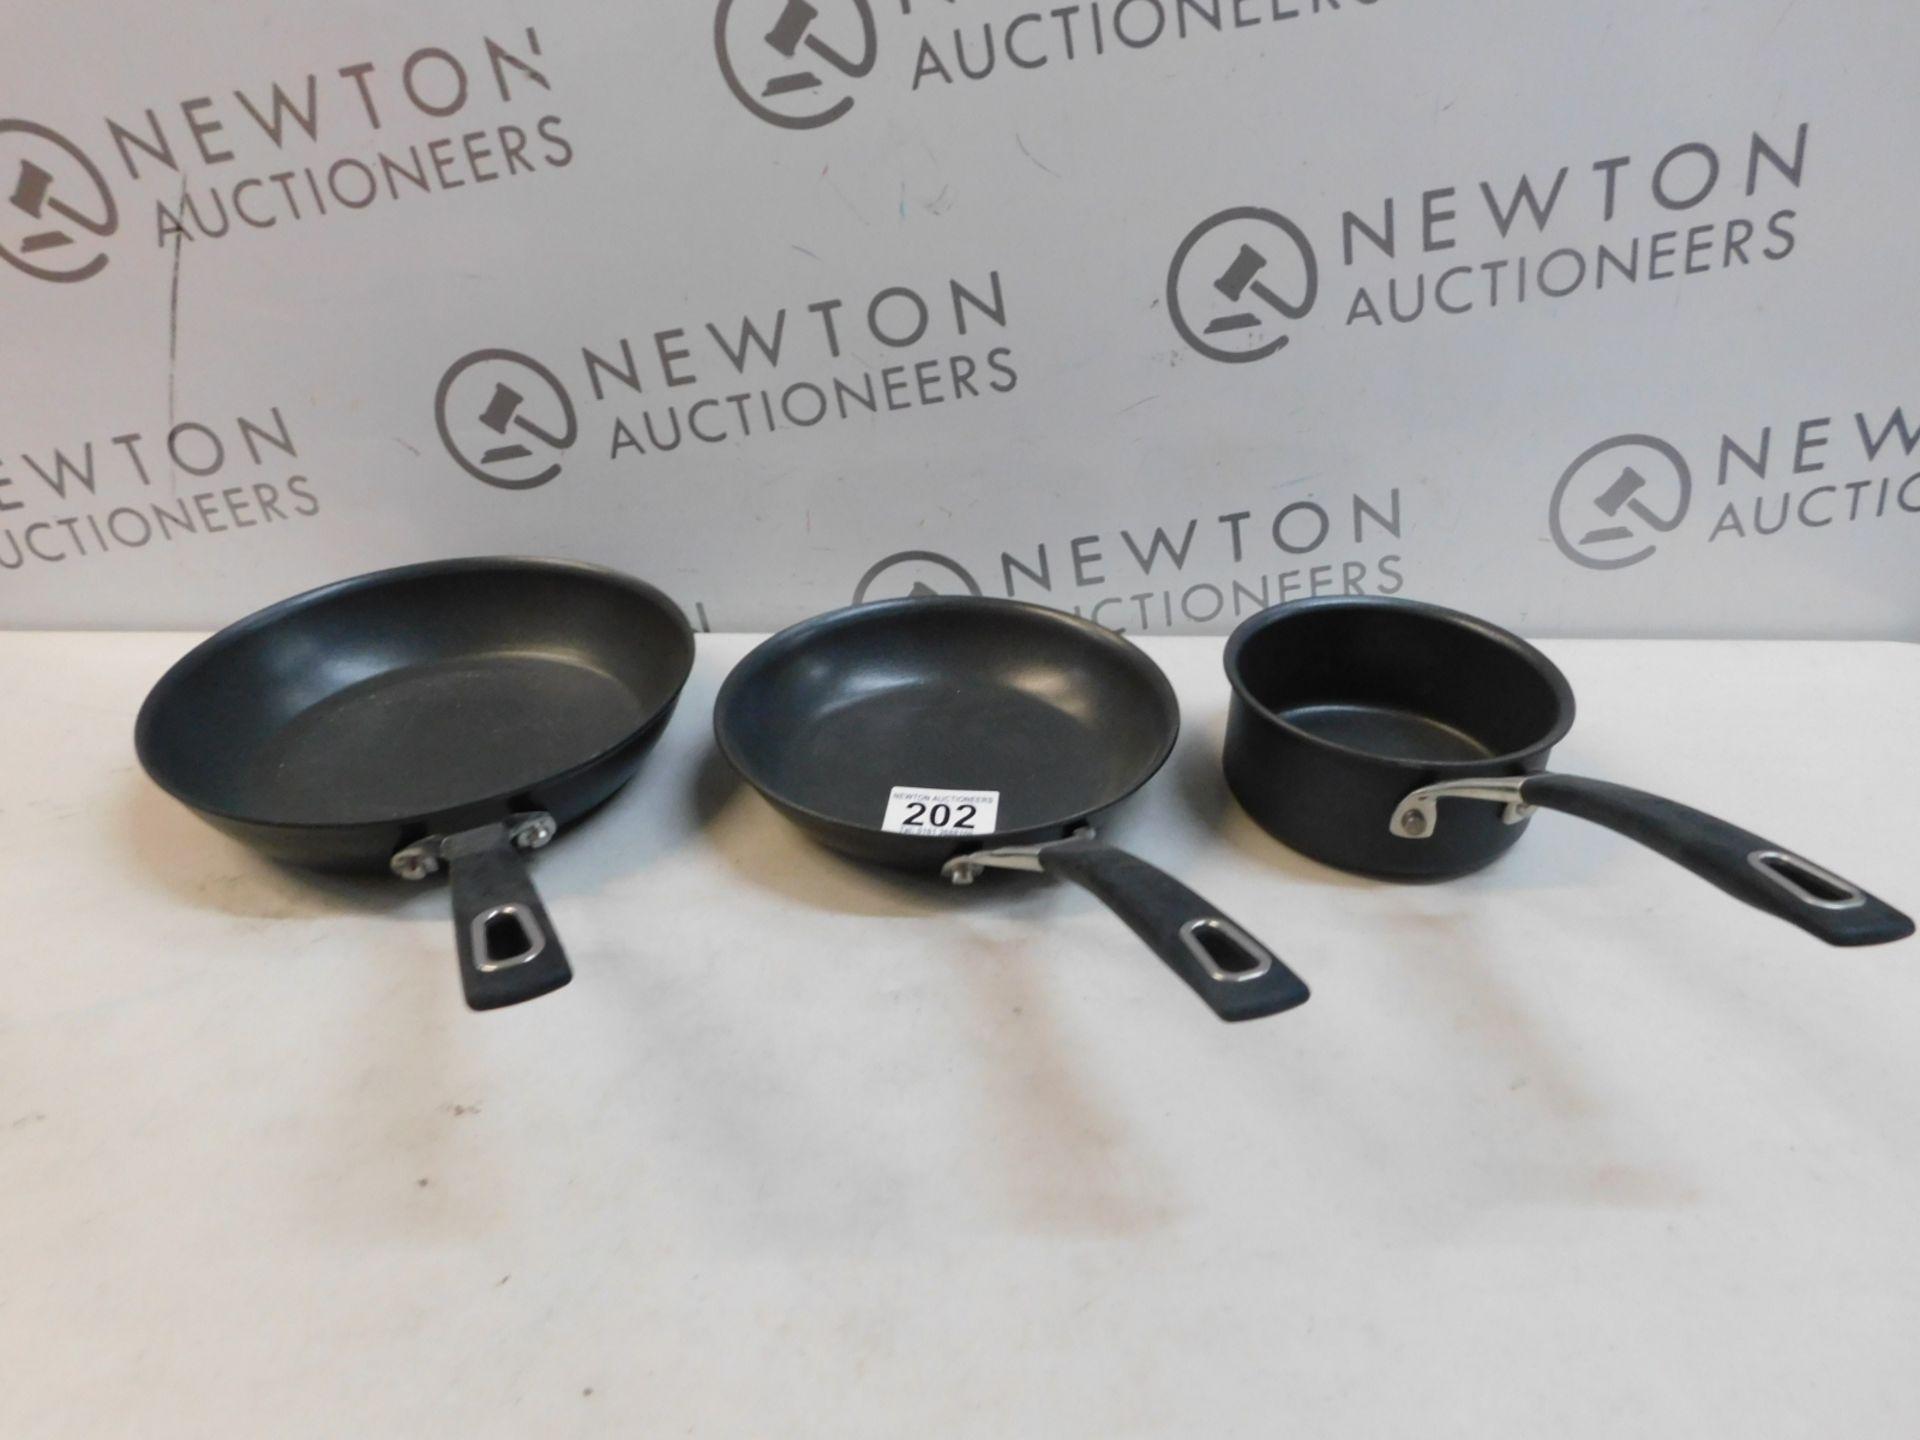 1 SET OF 2 ANOLON FRYING PANS RRP £59